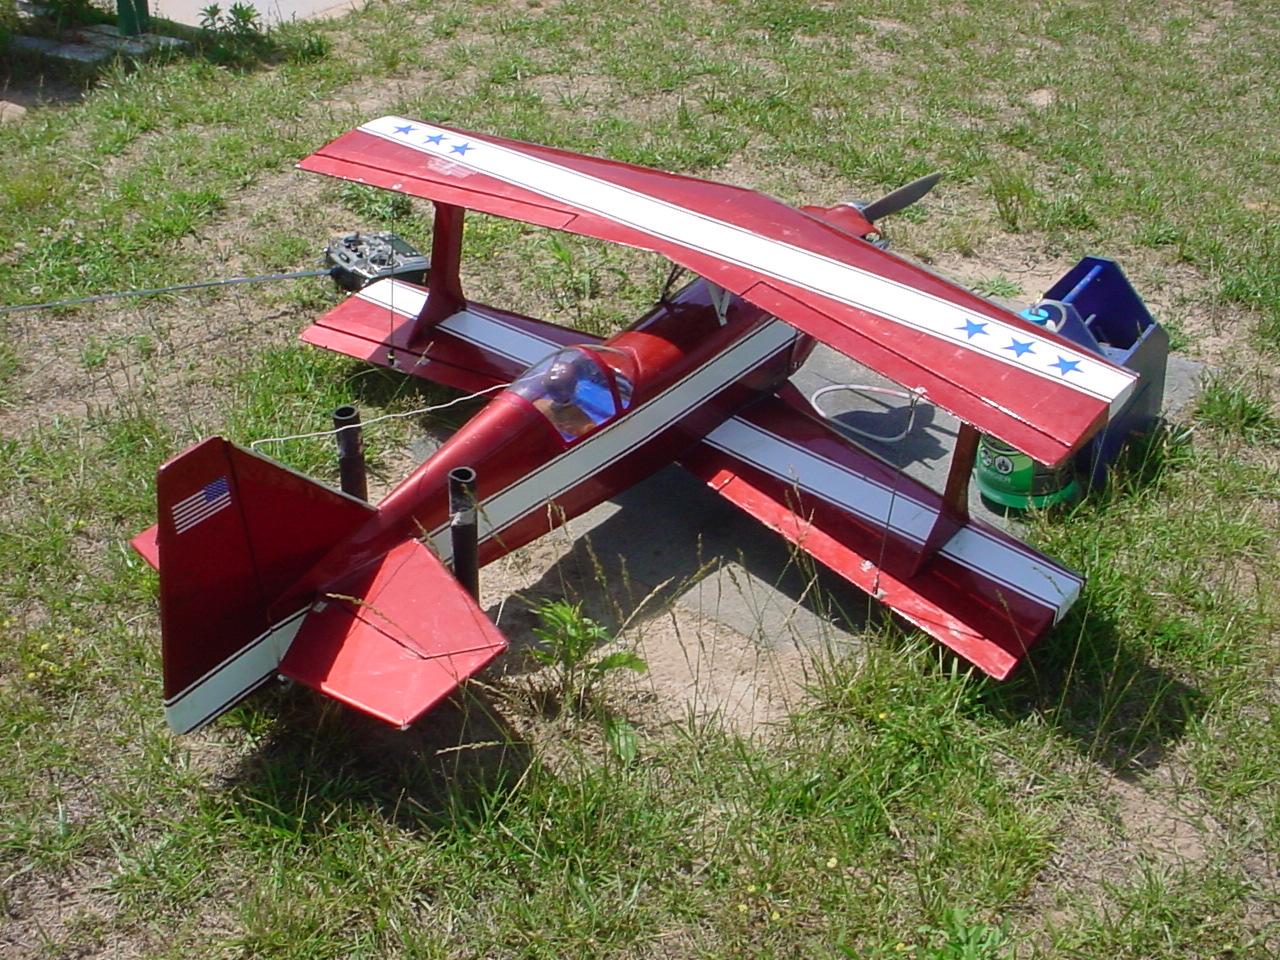 gliders-06-04-06-20